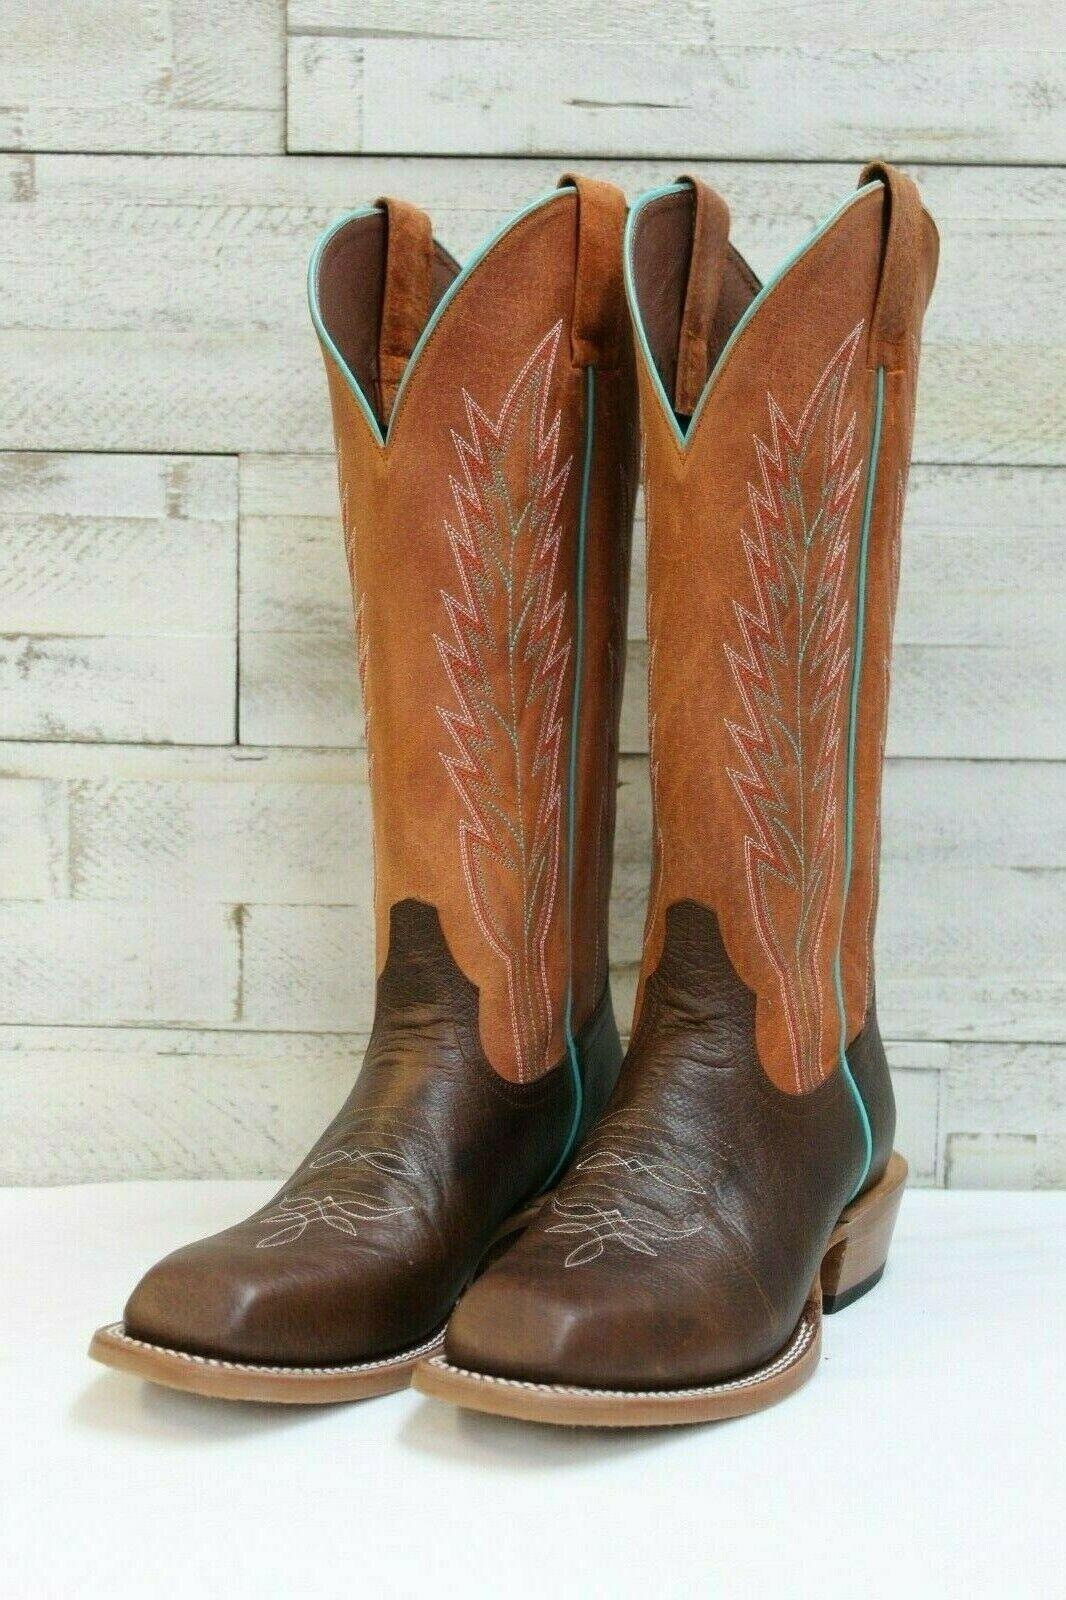 Men's Horsepower by AB Boots, Mocha Sabatoge w orange Sinsation Top, HP 6106